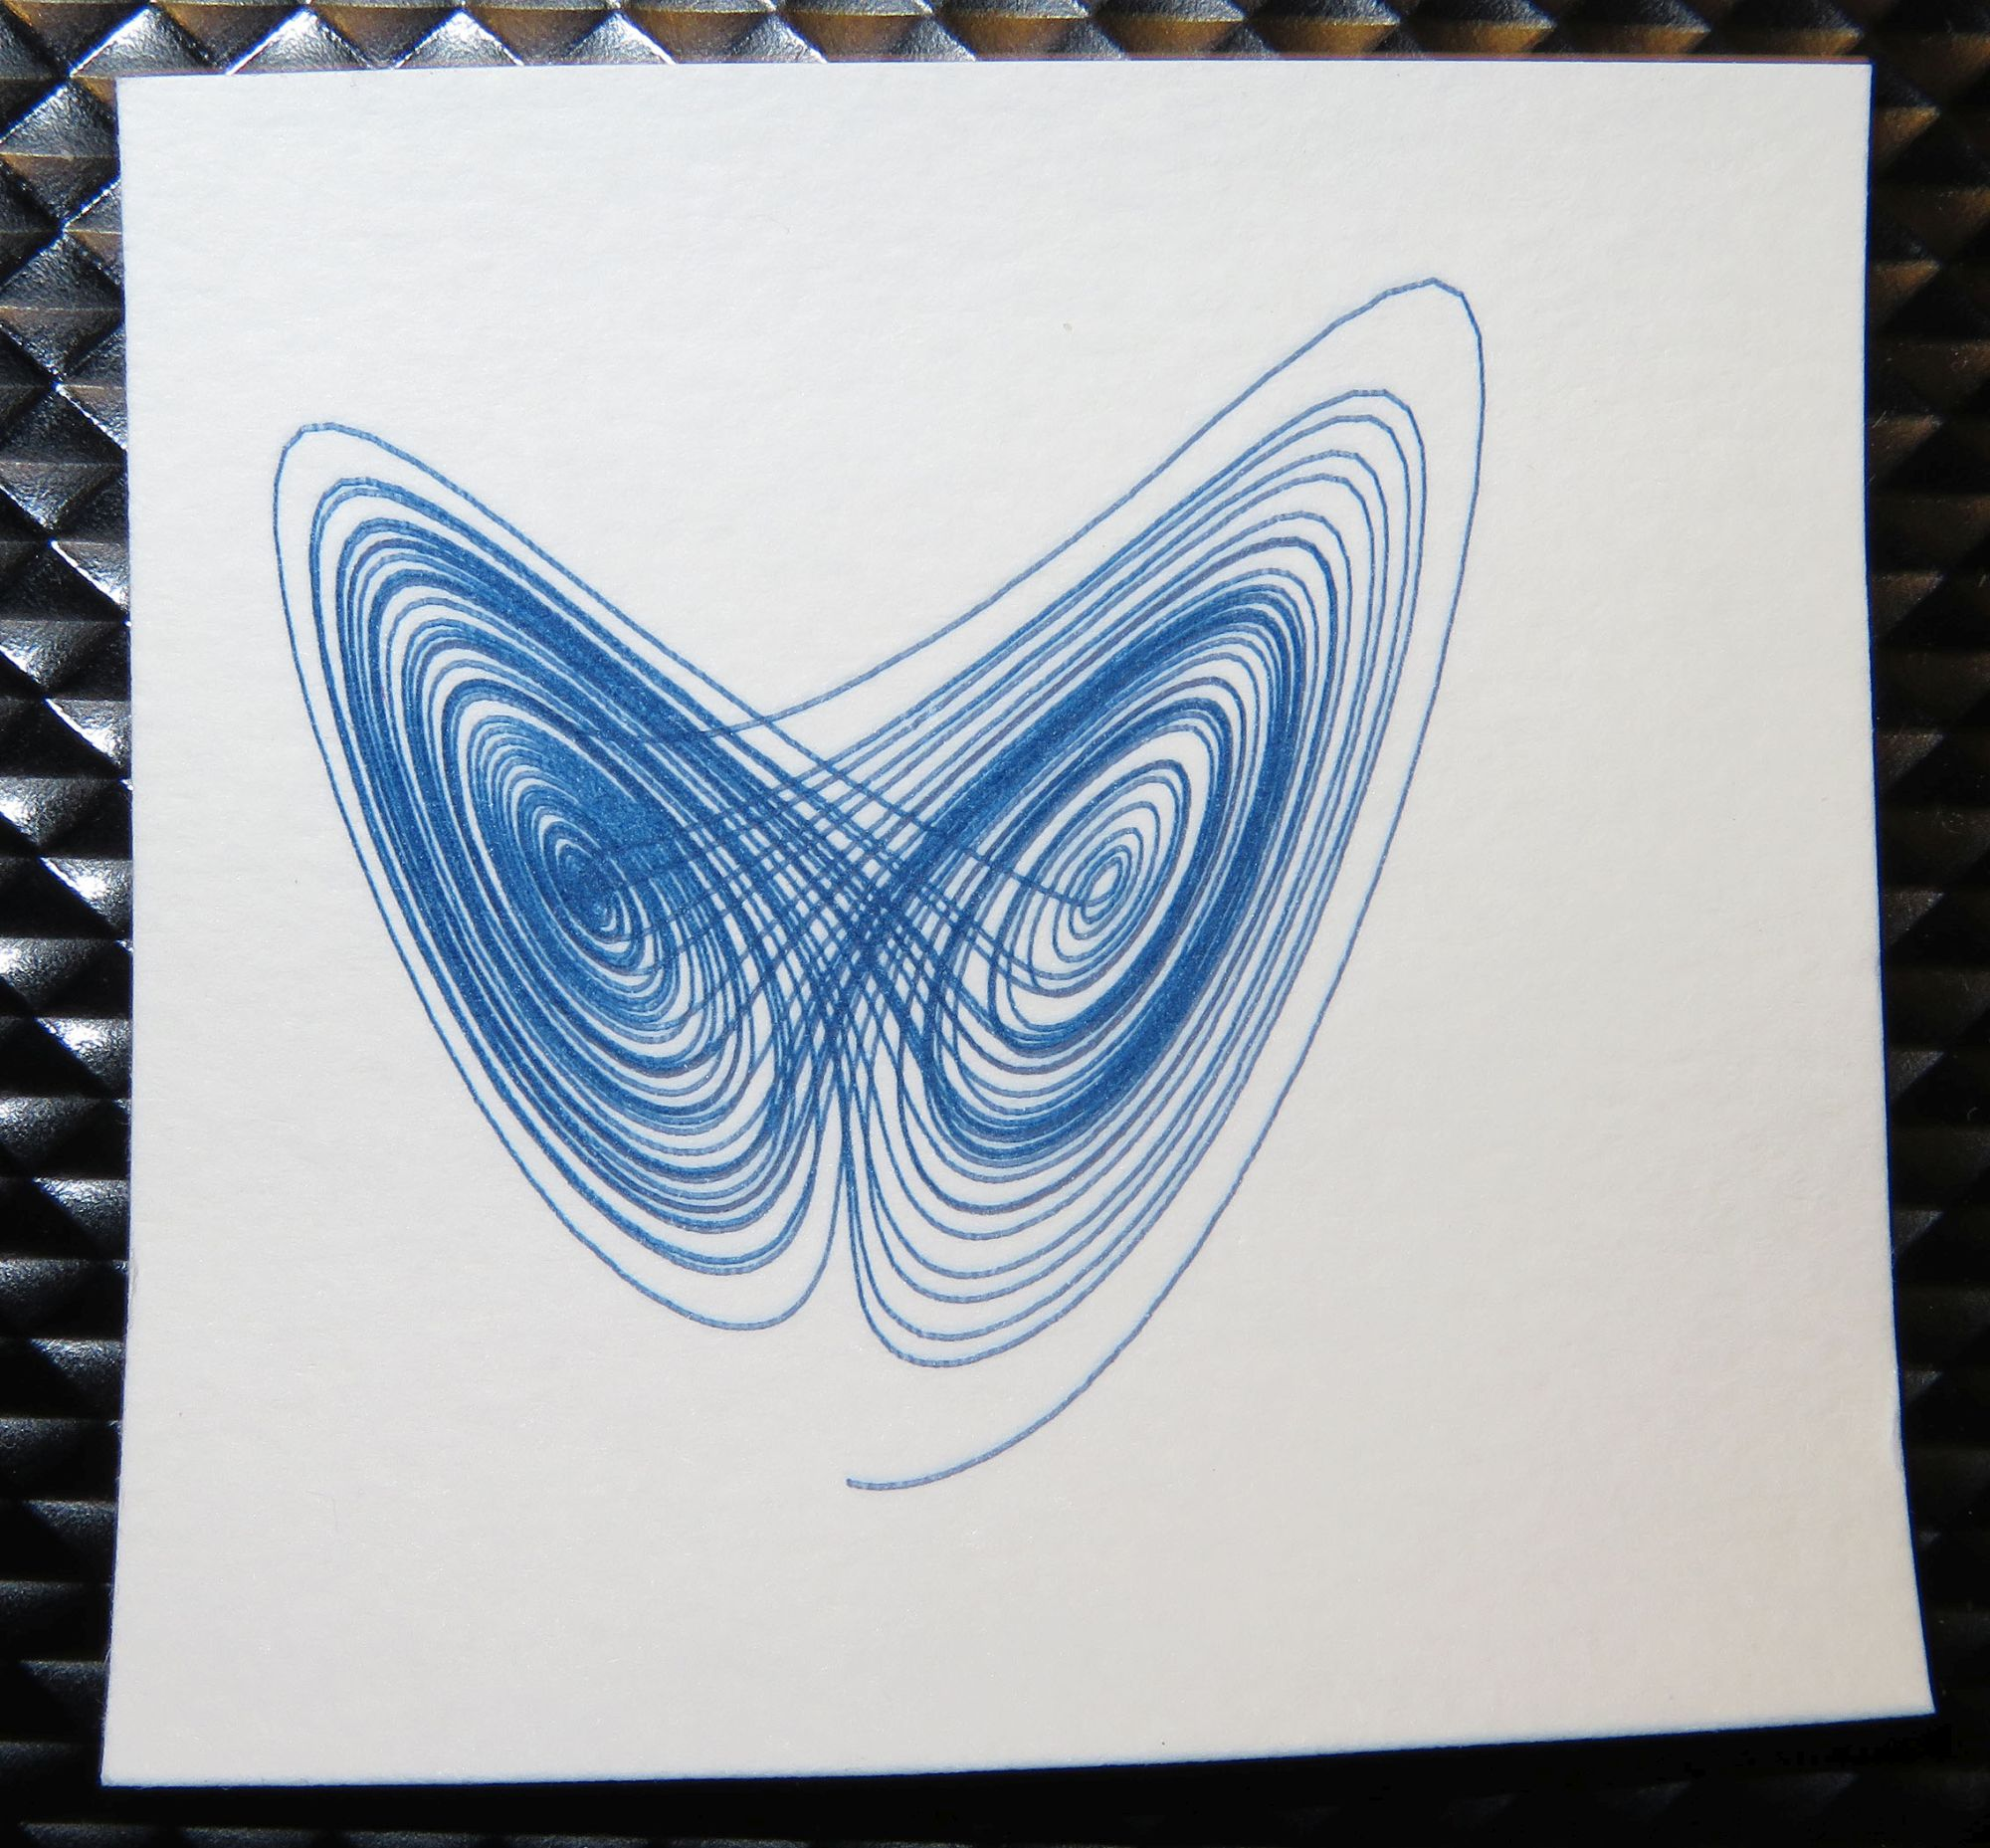 AxiDraw - UV laser exposing Cyanotype paper